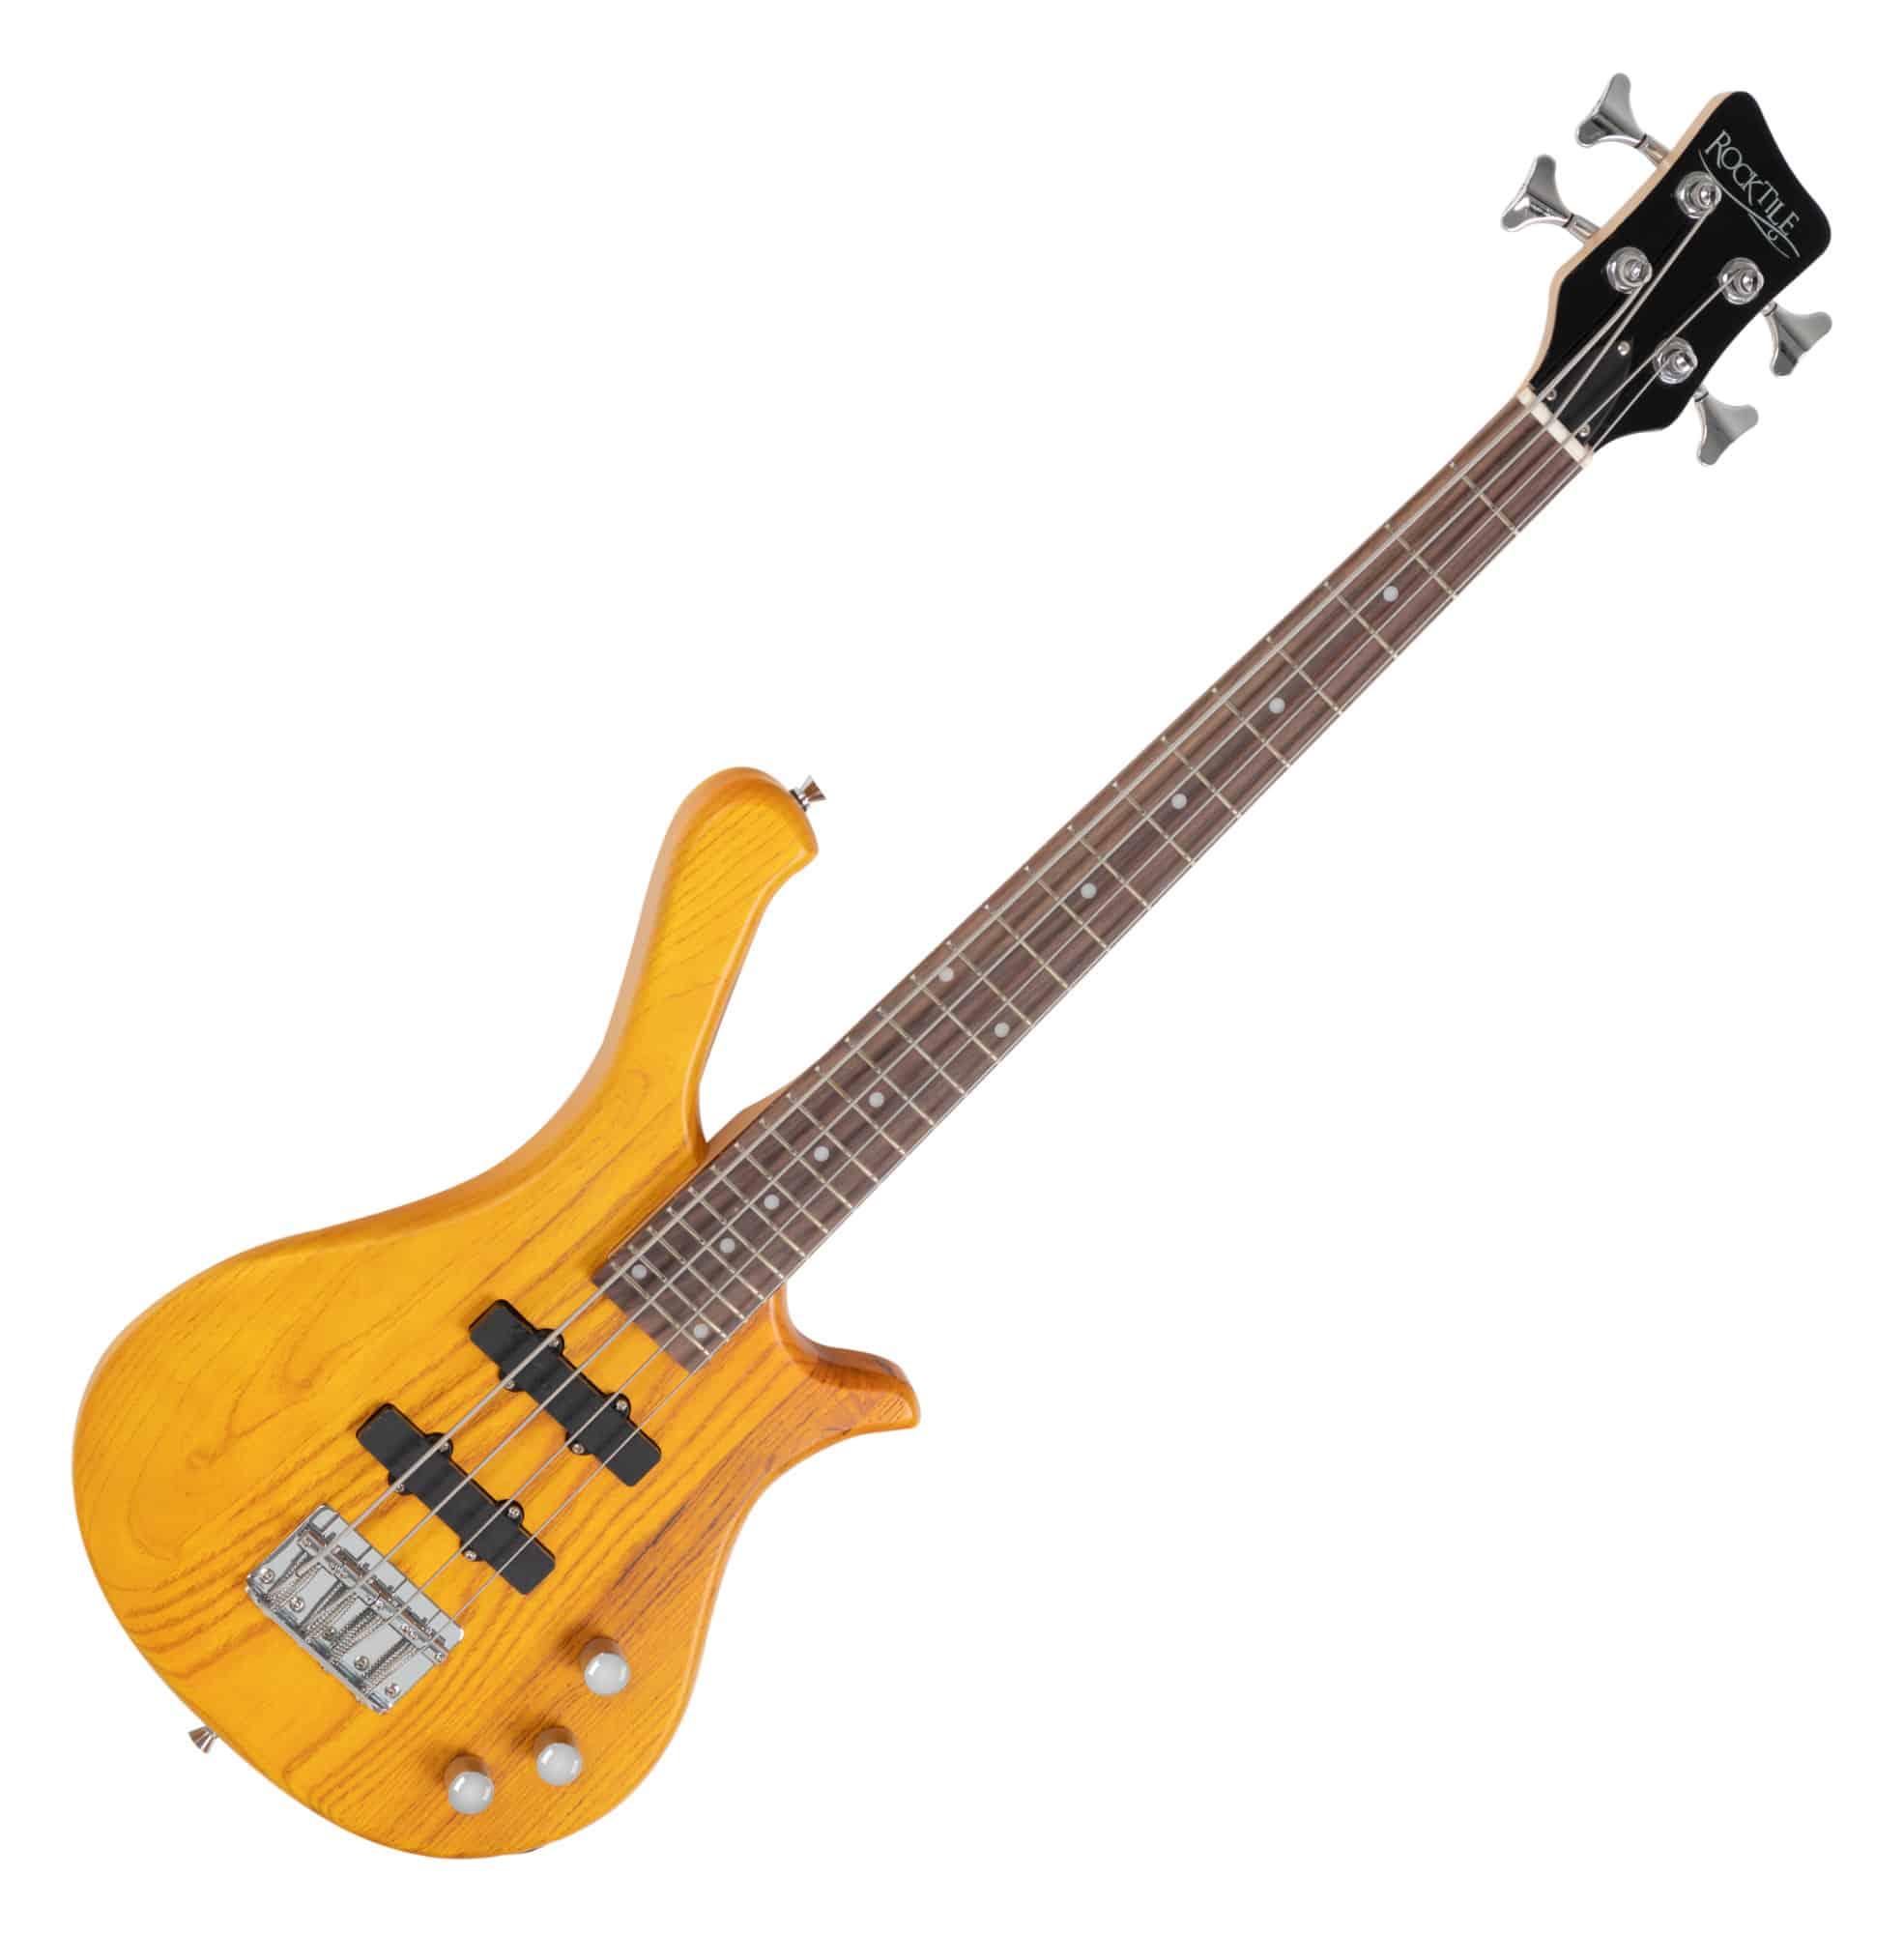 Kindergitarren - Rocktile TB 4 NHS Traveler E Bass - Onlineshop Musikhaus Kirstein